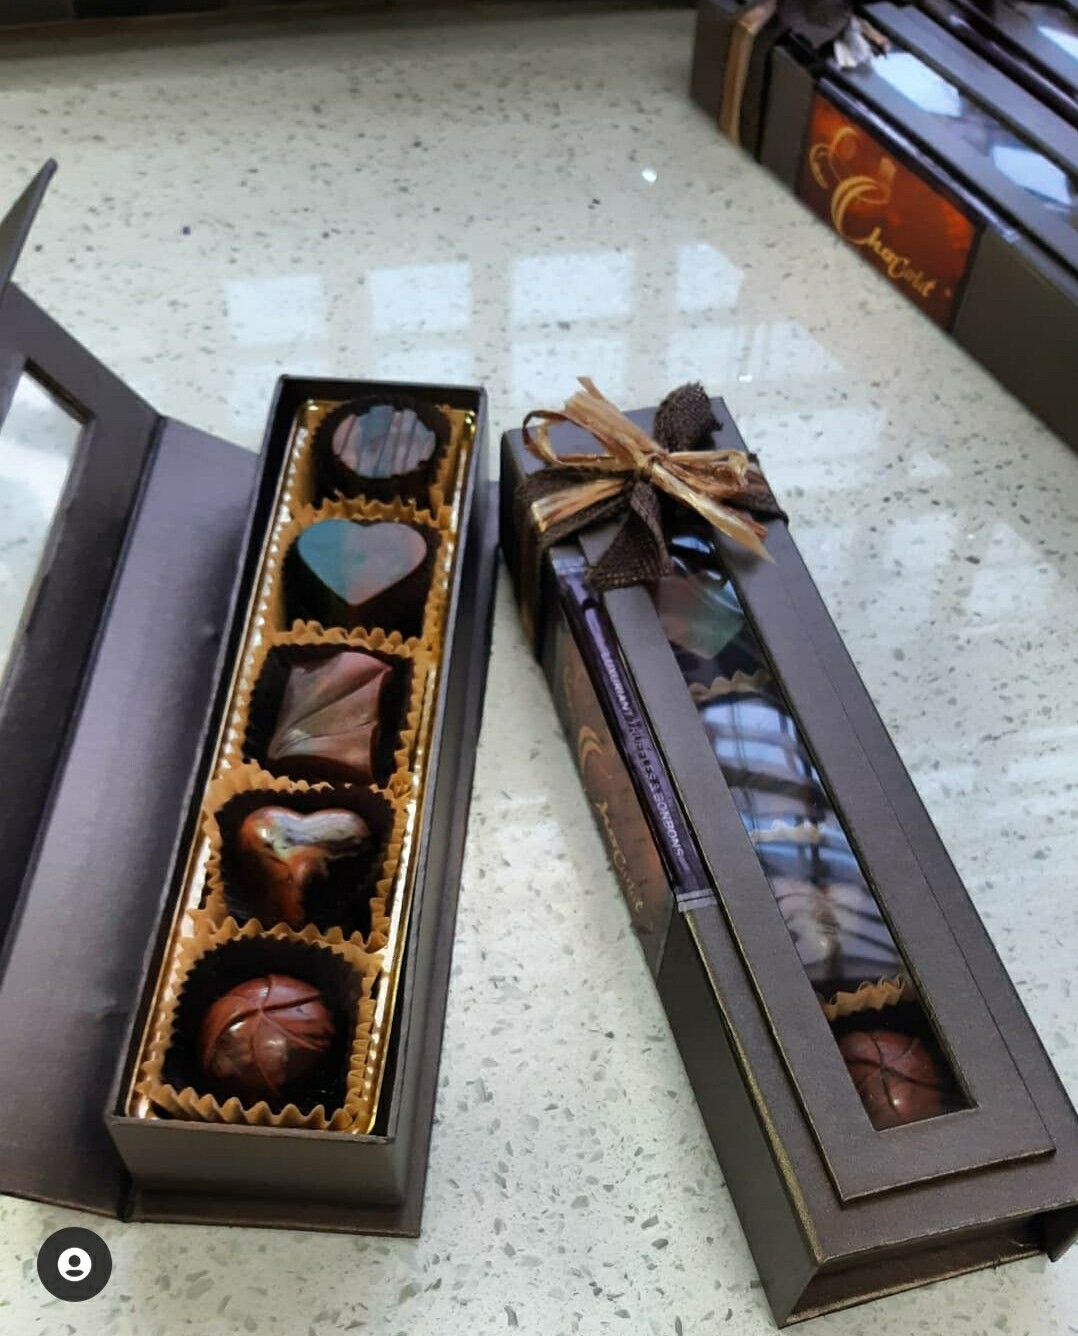 CHOCARLAT®️ Deluxe Gift Box 10Piece Bonbons